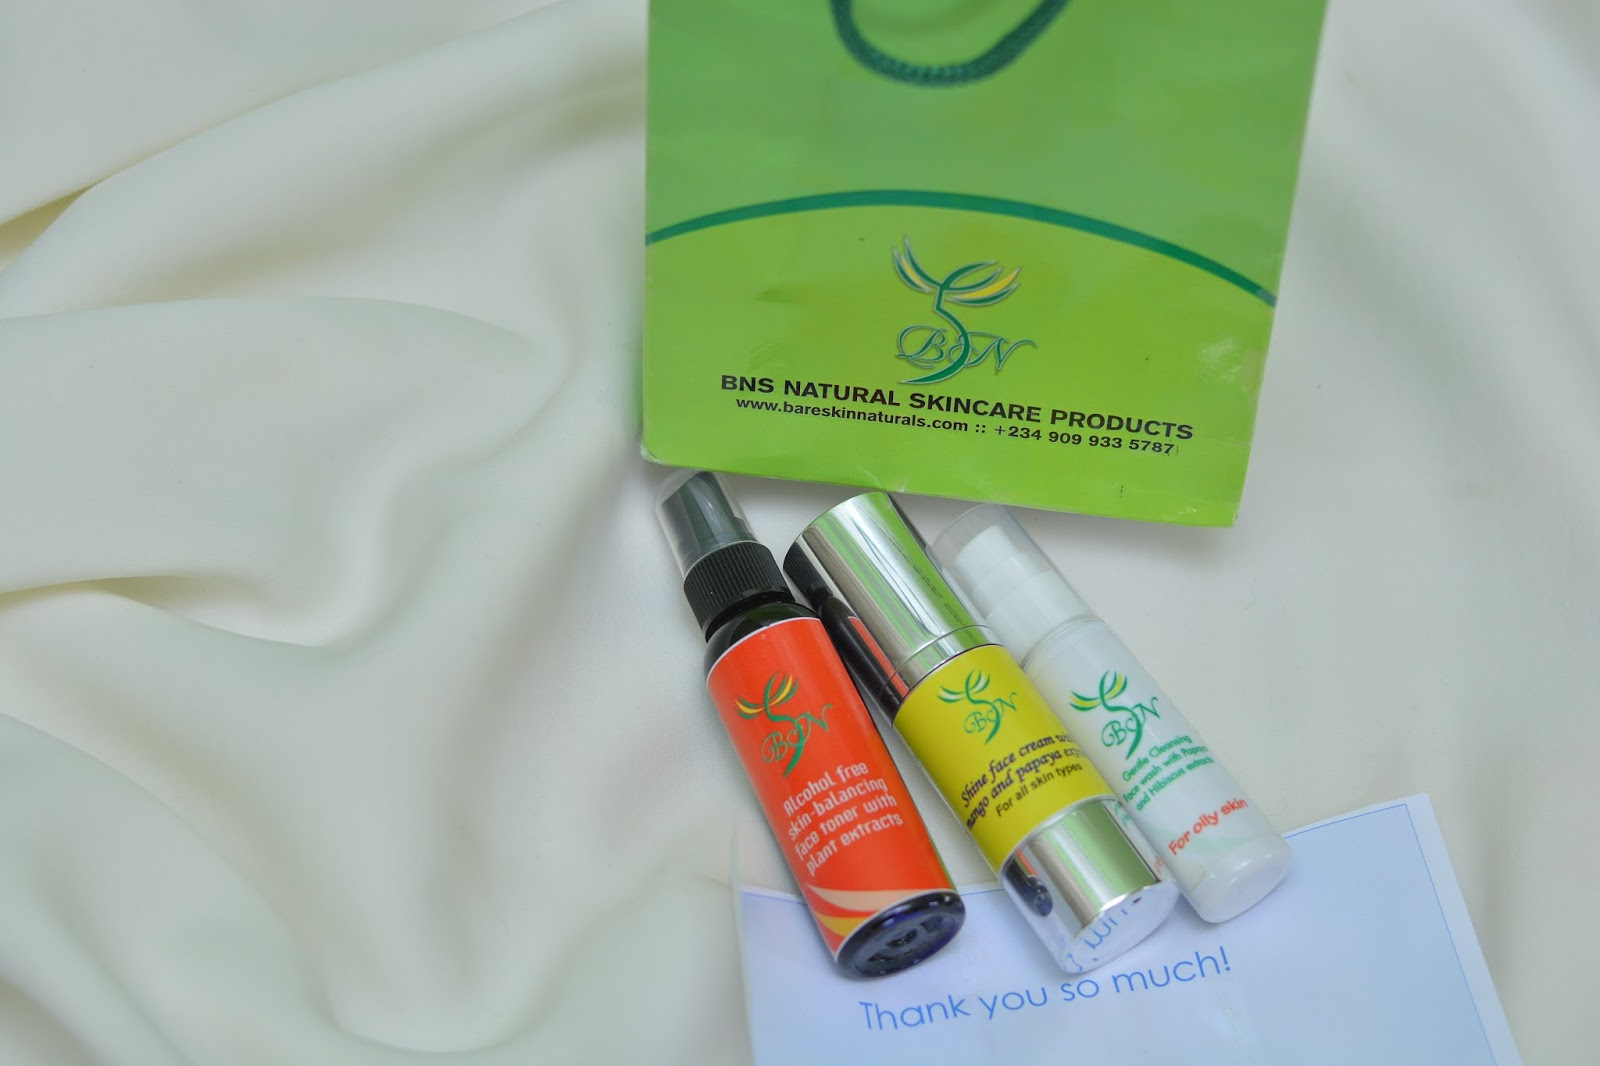 Bare Skin Naturals skin care company